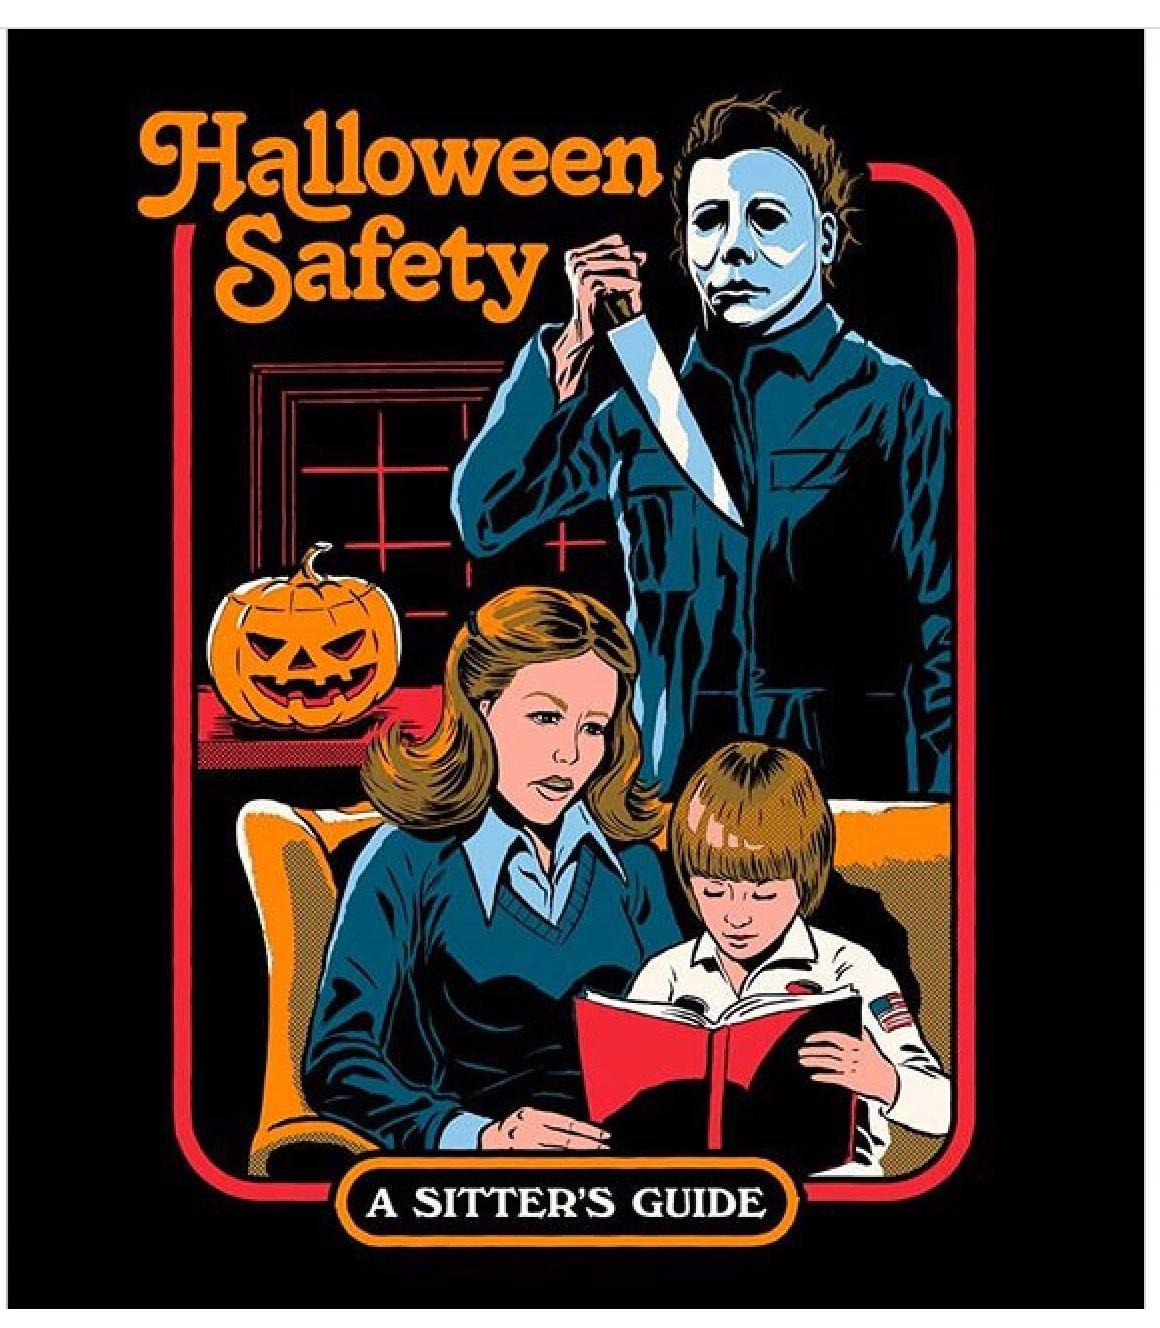 Pin by Zulema Reyes on Creepy | Halloween safety, Horror movie art, Retro  illustration